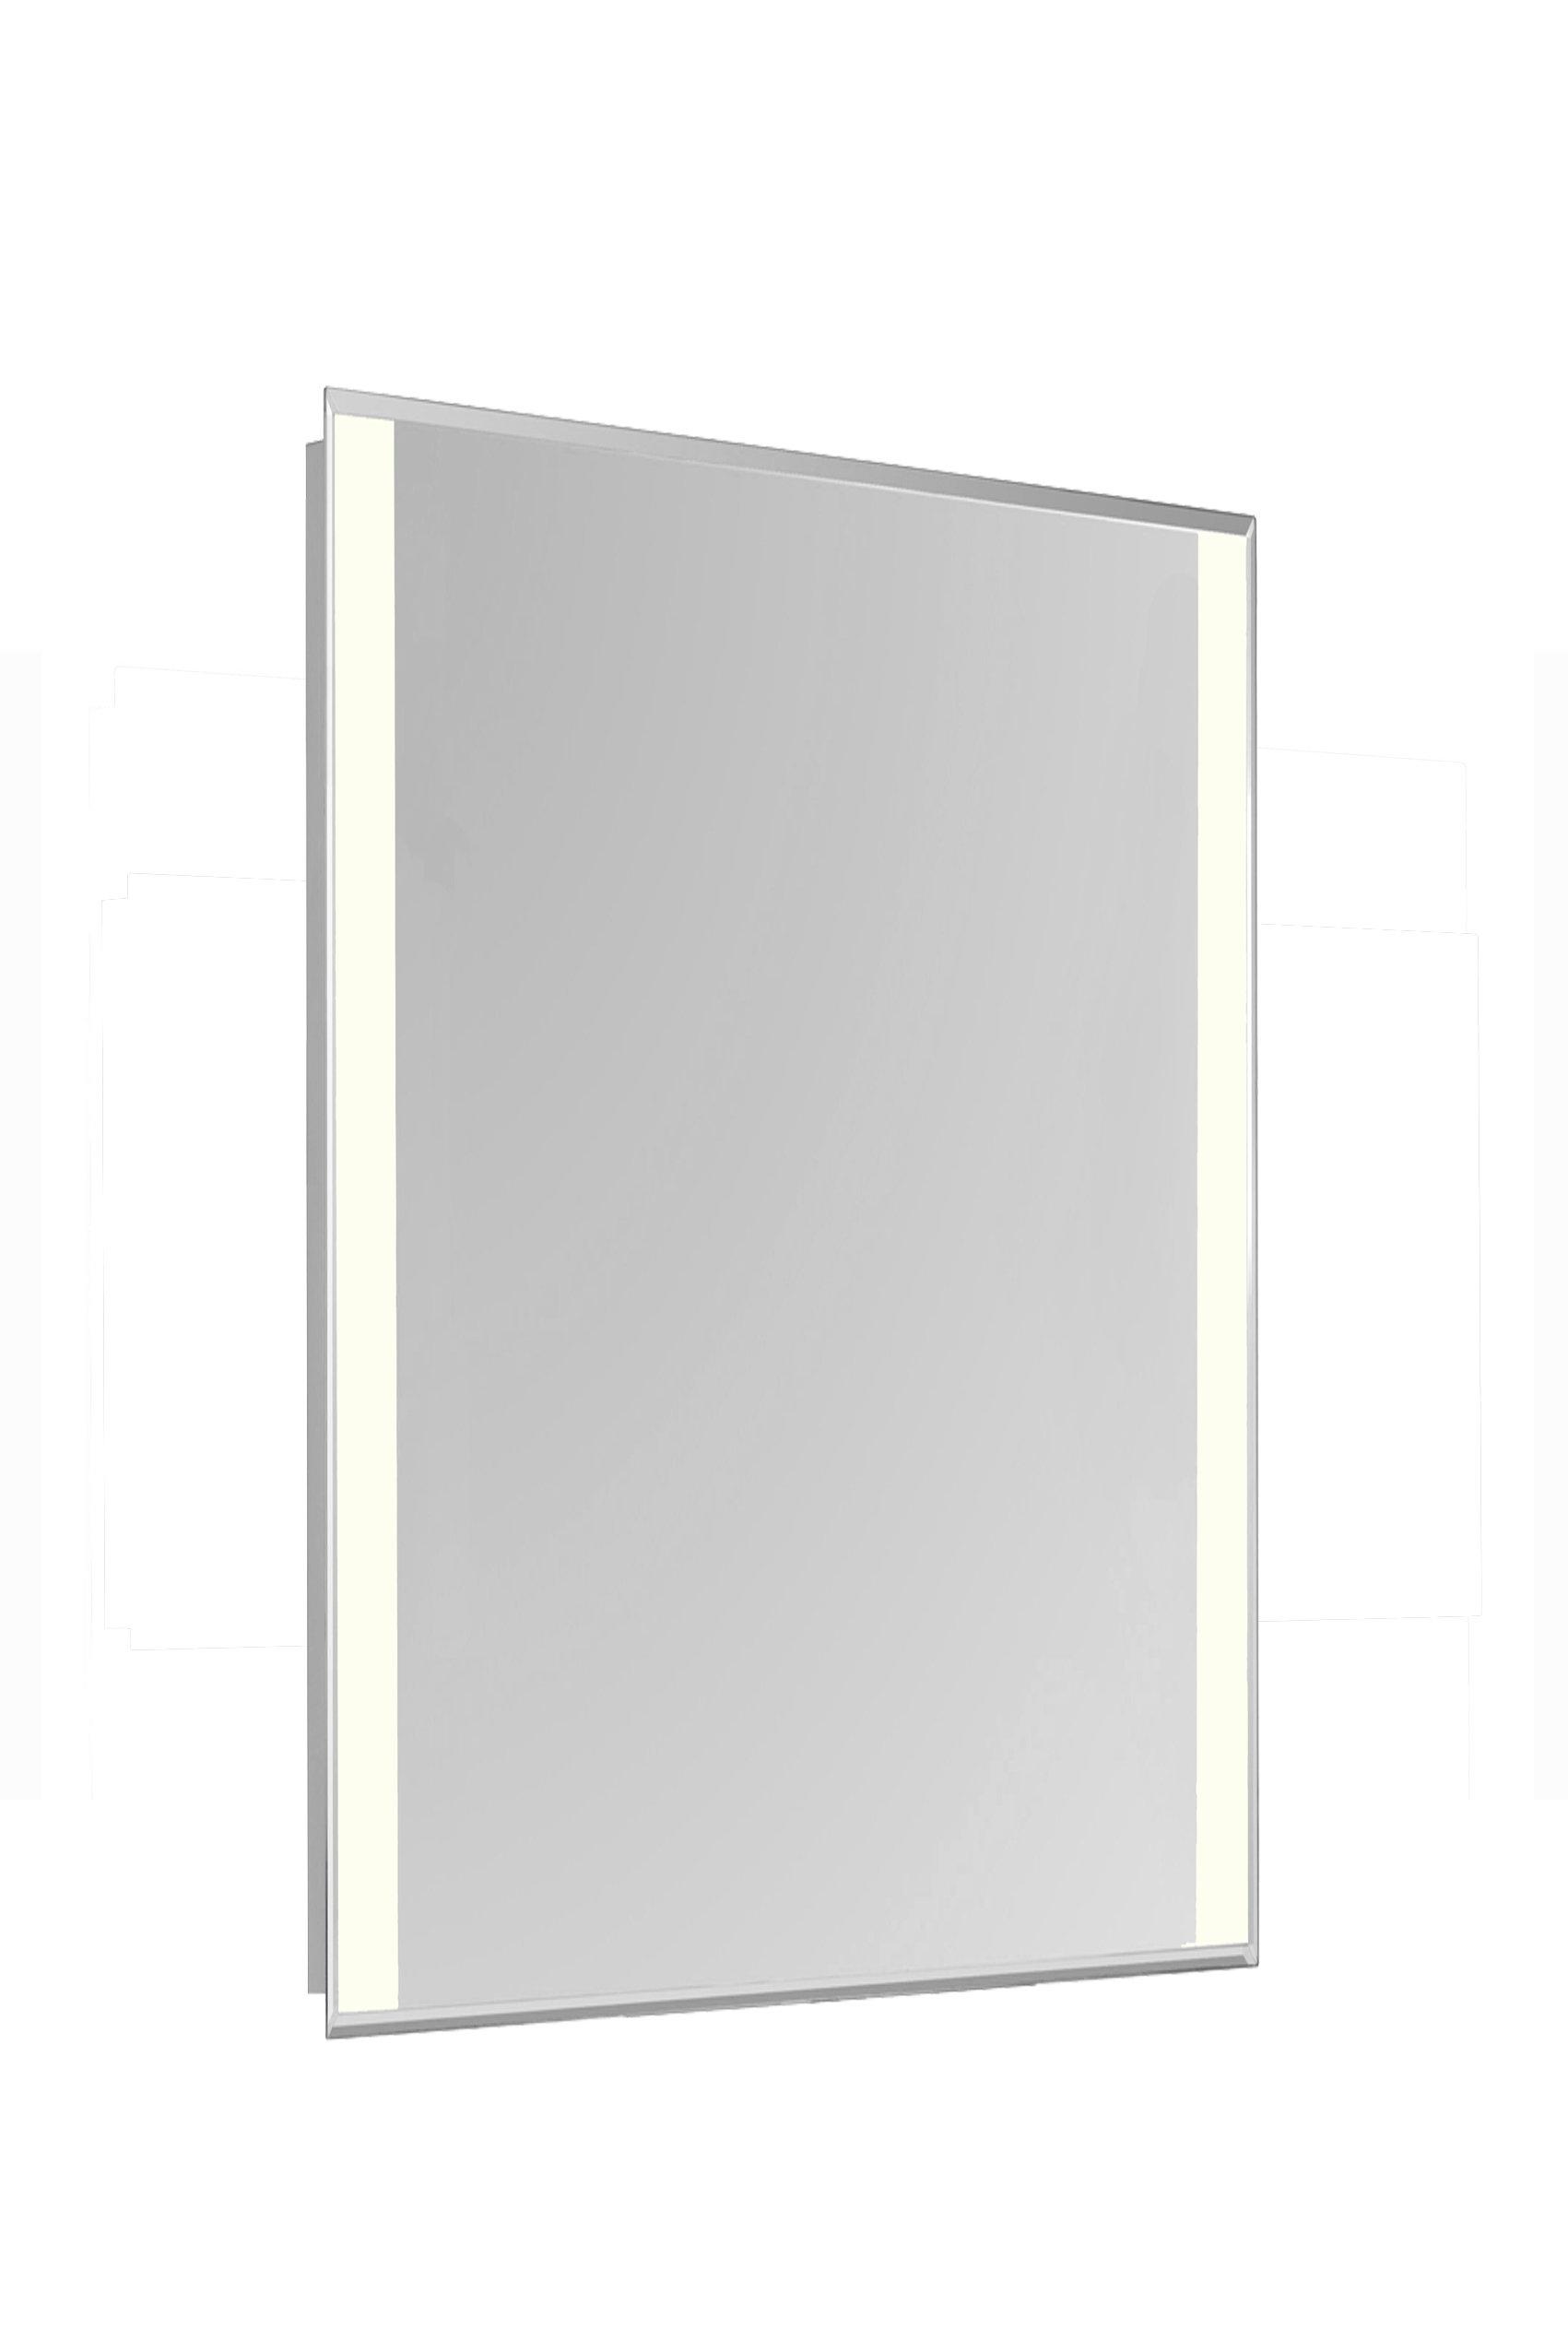 Musson Edge Electric Bathroom / Vanity Mirror For Mexborough Bathroom/vanity Mirrors (Image 13 of 20)